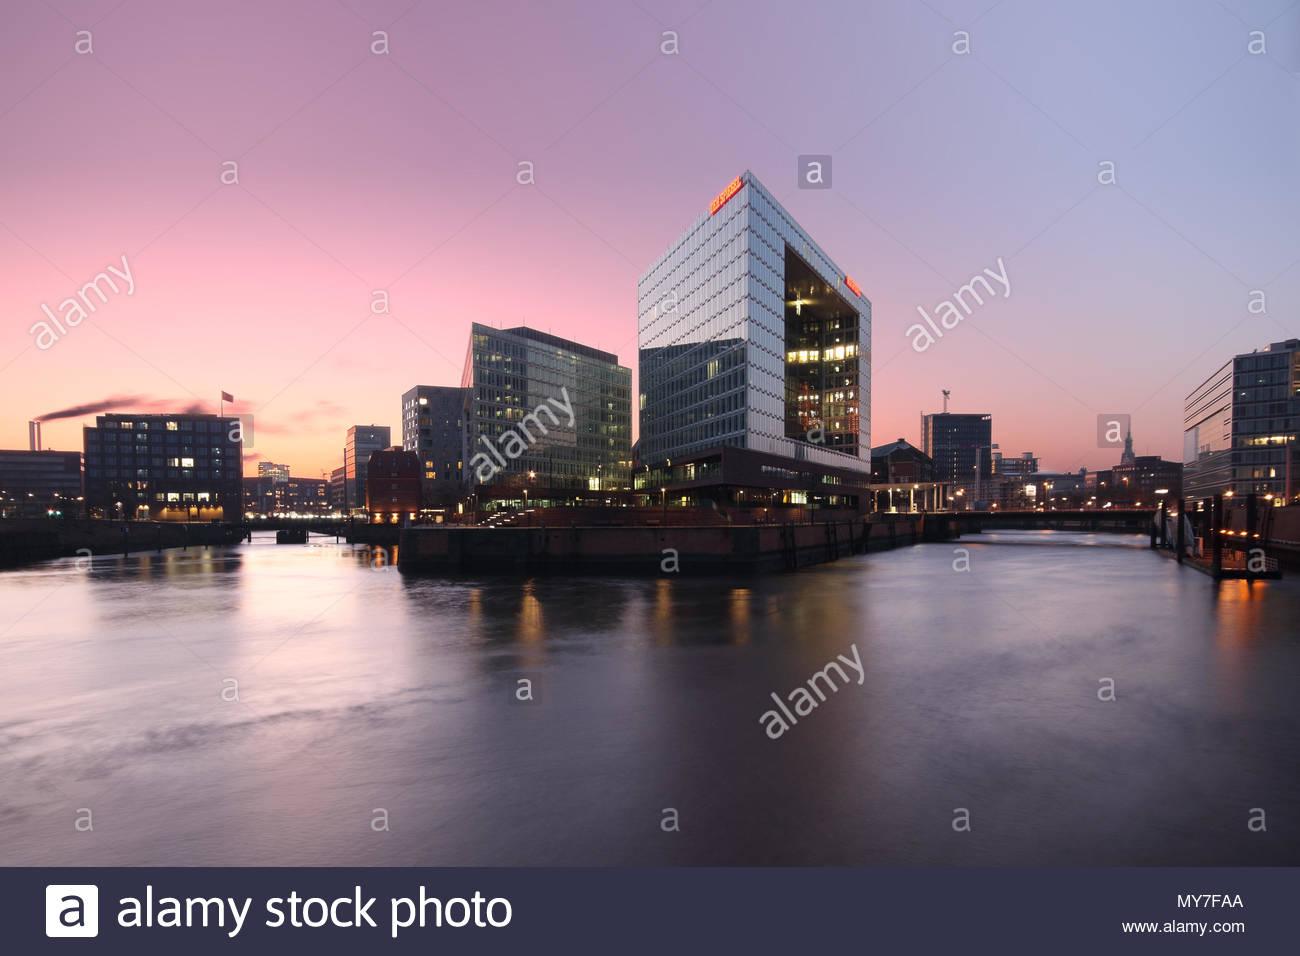 Headquarters of Der Spiegel, Hamburg, Germany - Stock Image